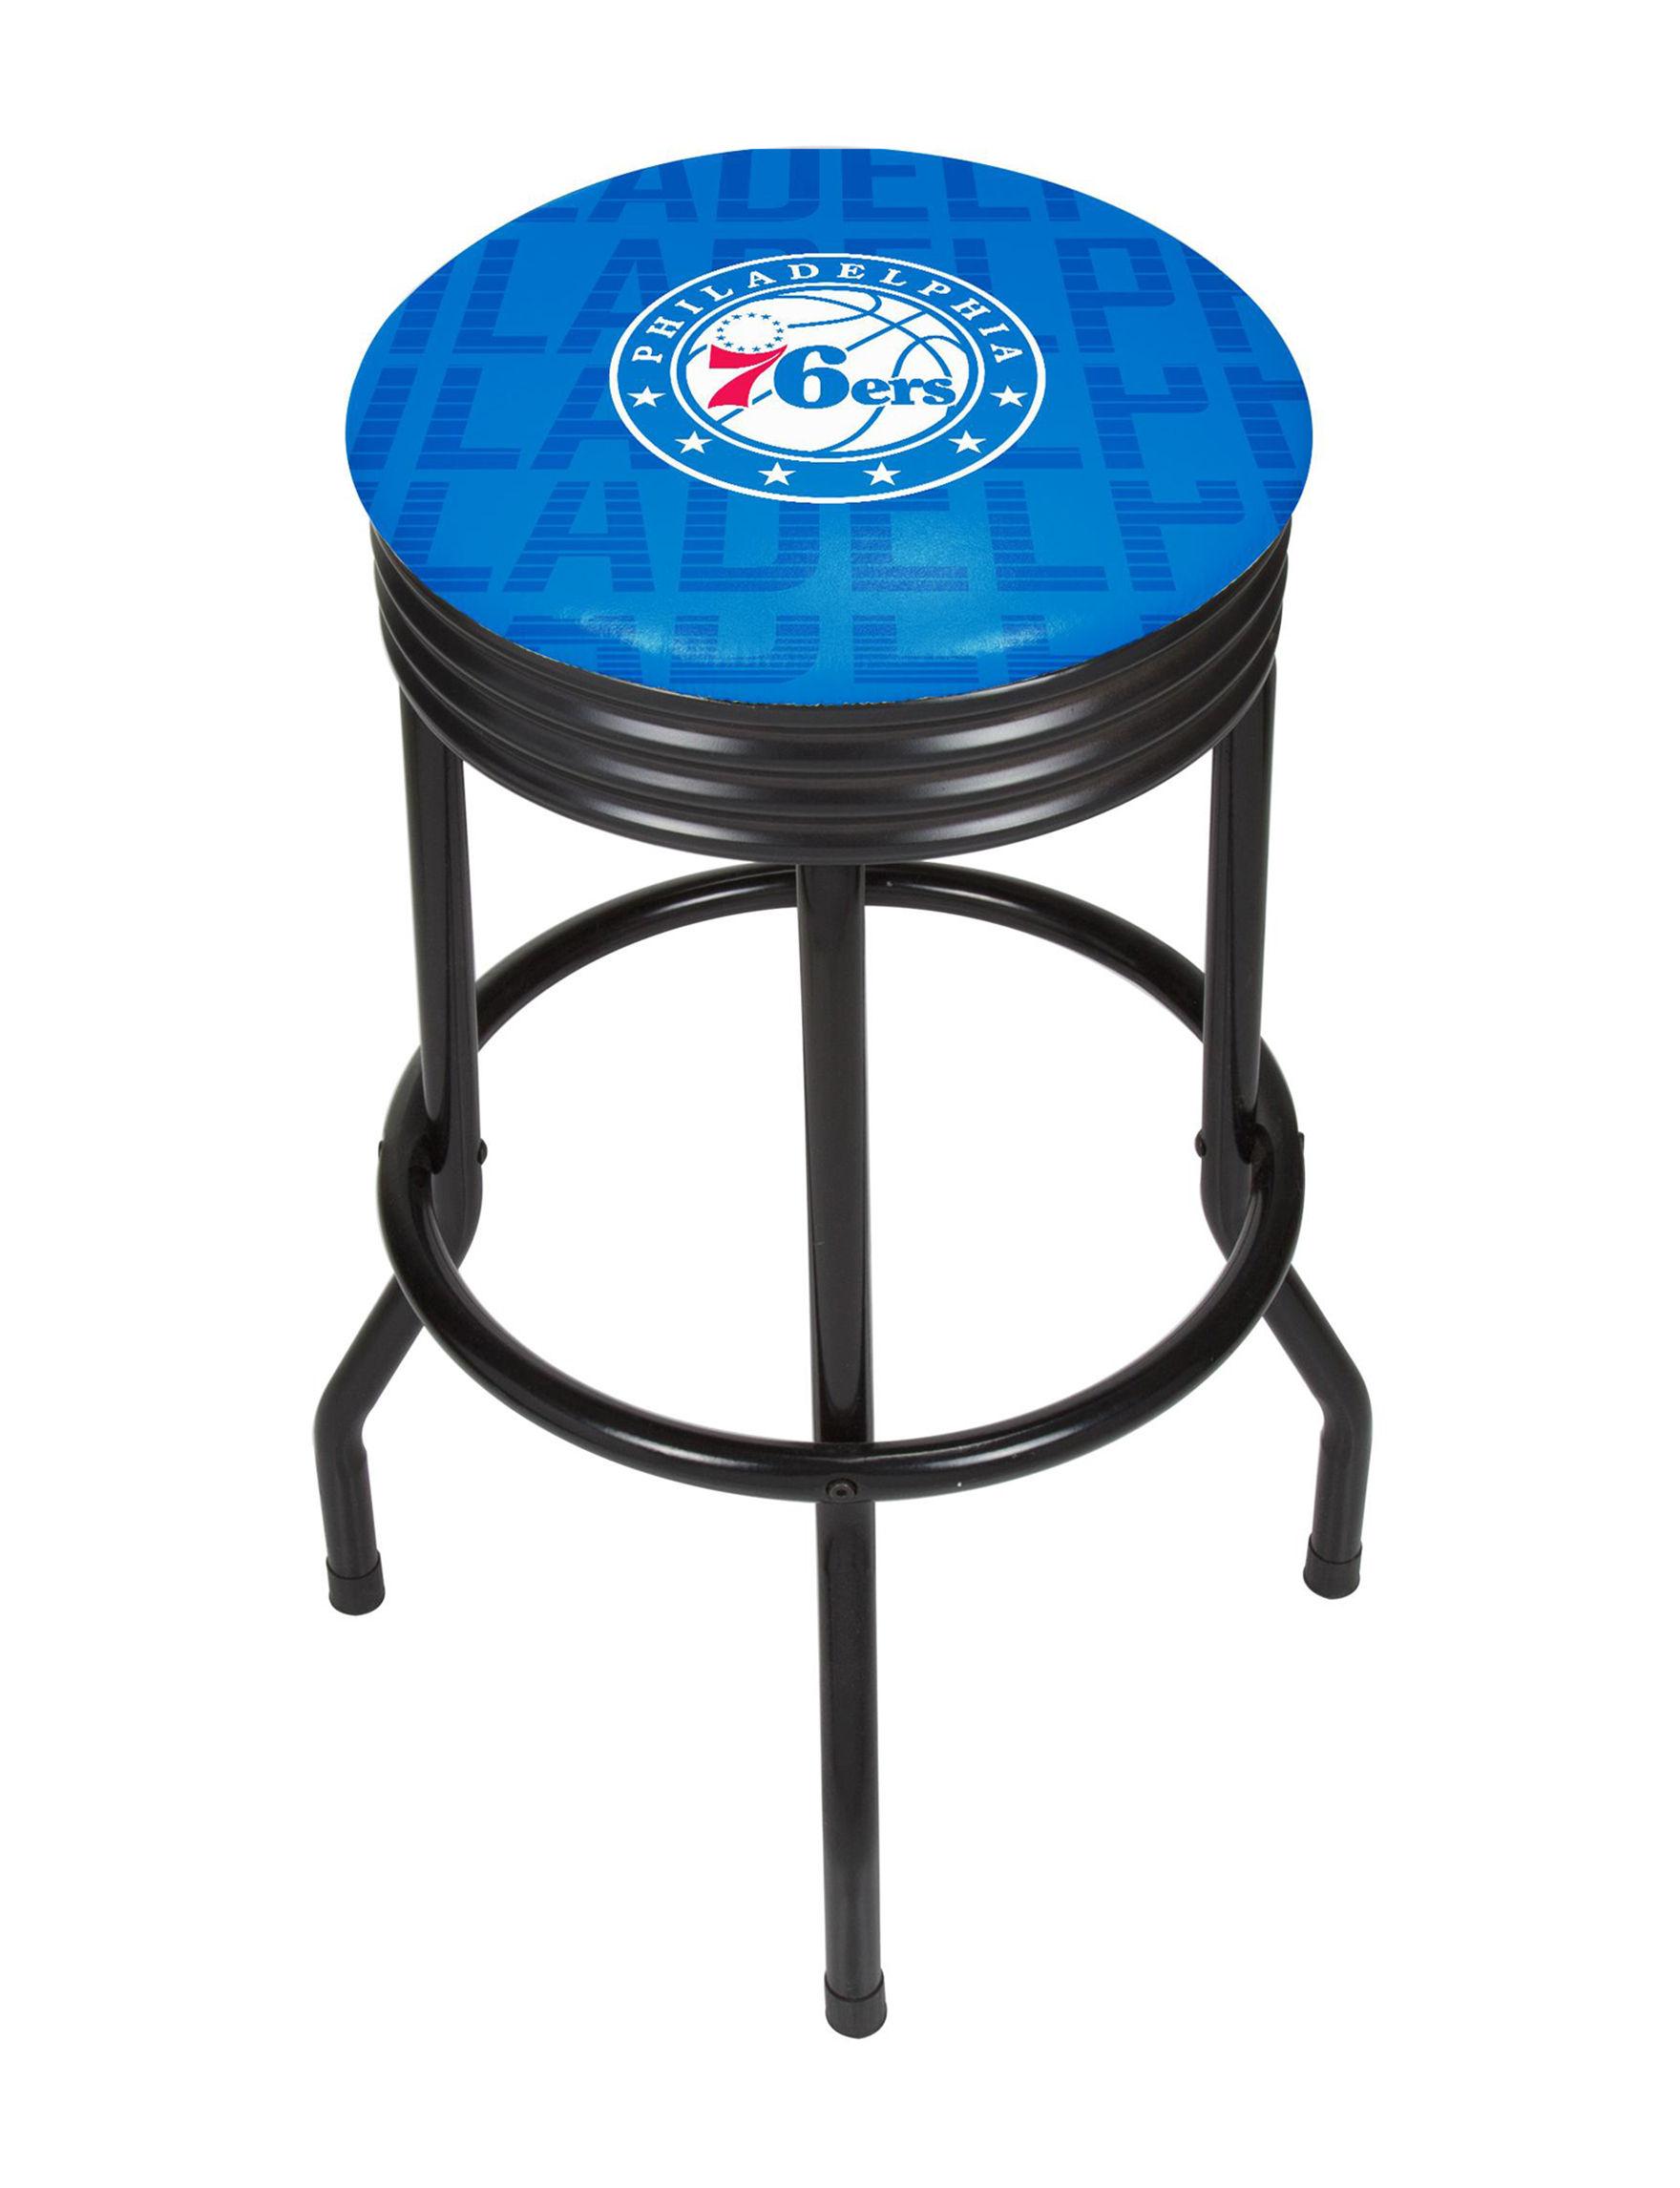 NBA Red / White / Blue Bar & Kitchen Stools Kitchen & Dining Furniture